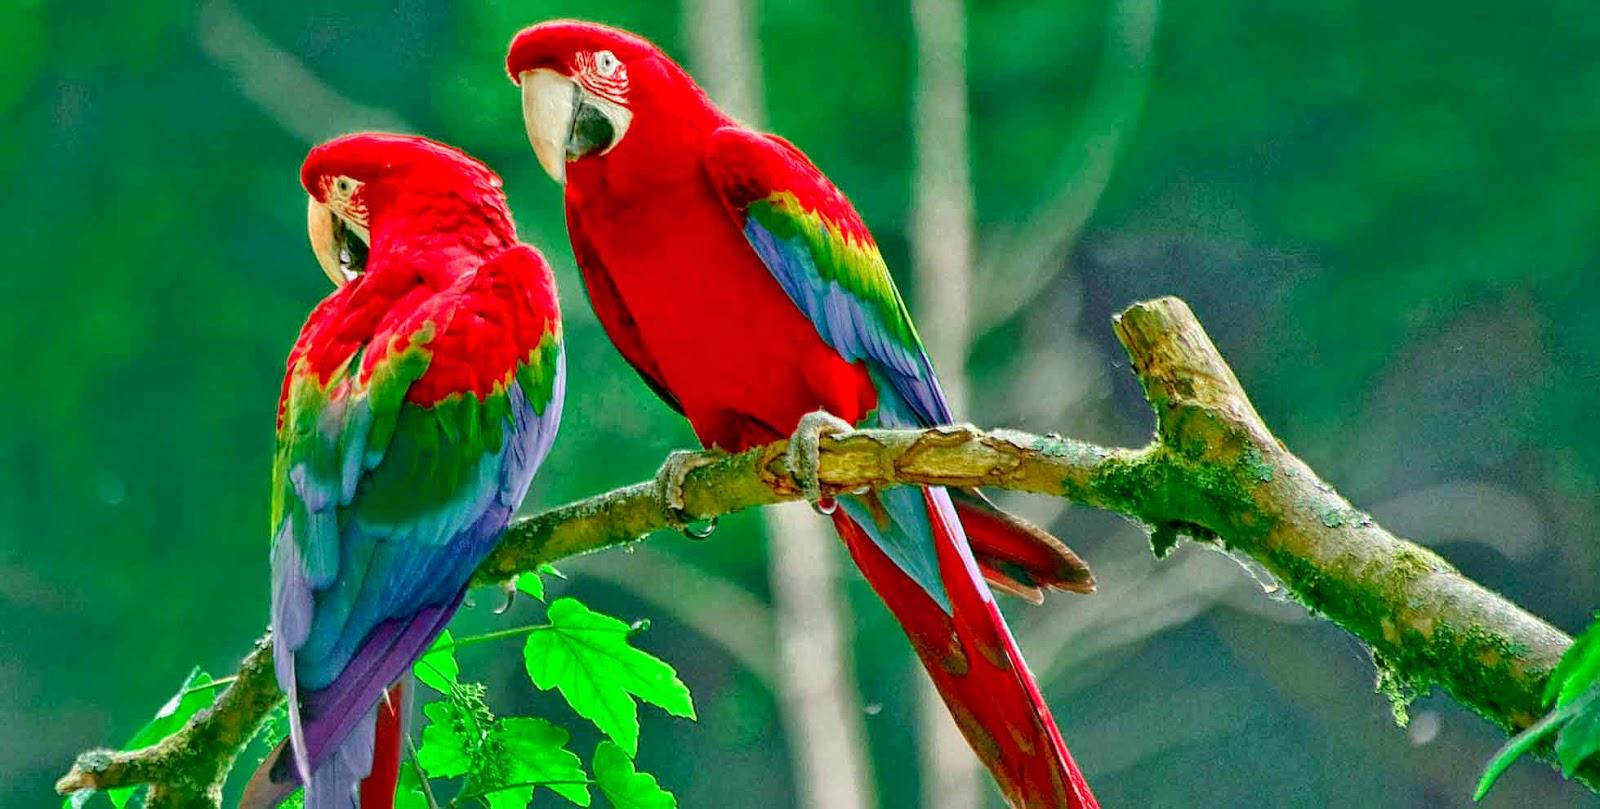 birds of paradise beautiful hd wallpaper desktop | high definitions